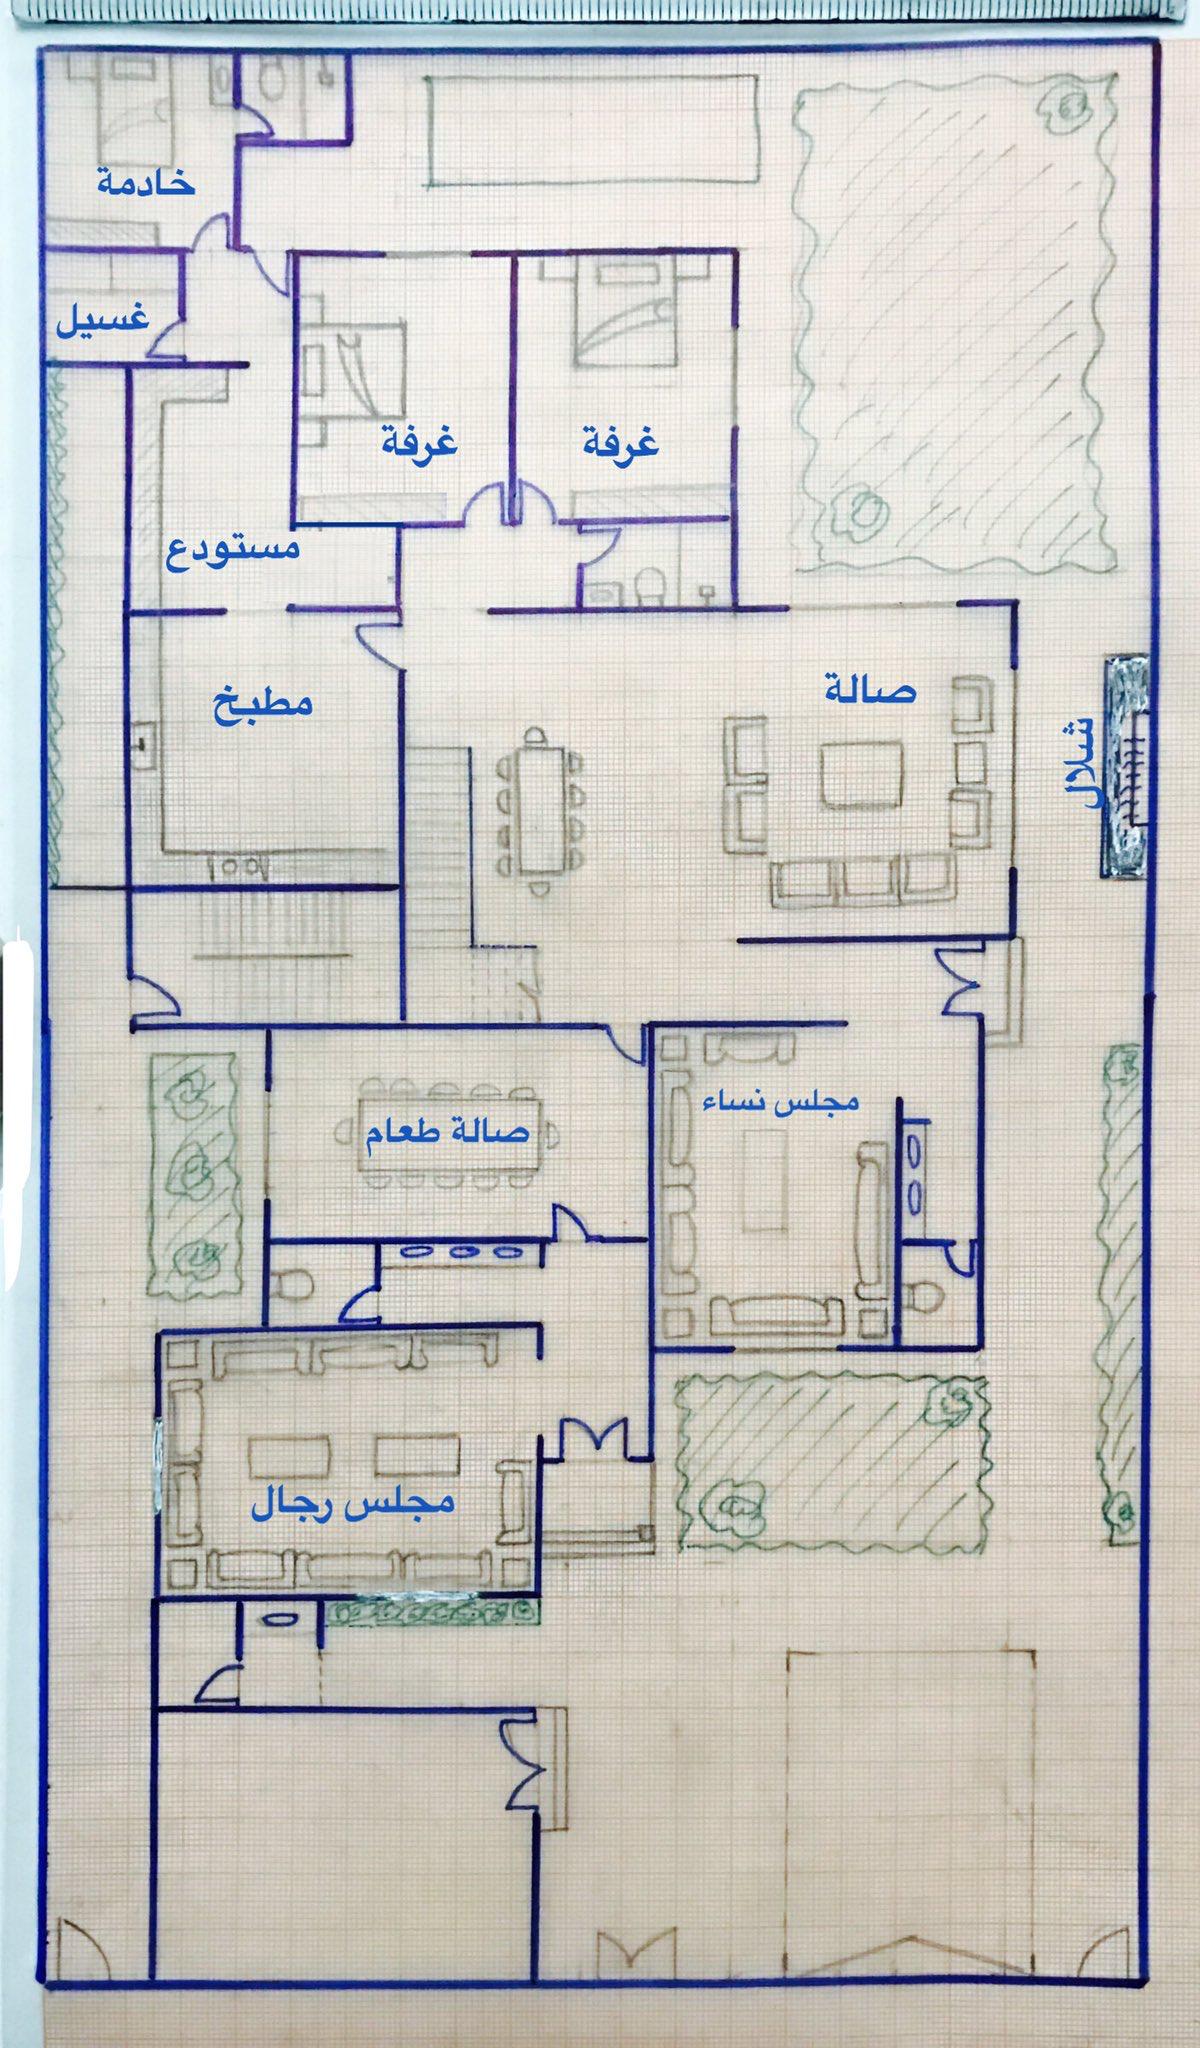 Pin By ماهر المزروعي On House Plans House Layout Plans Unique House Plans House Construction Plan